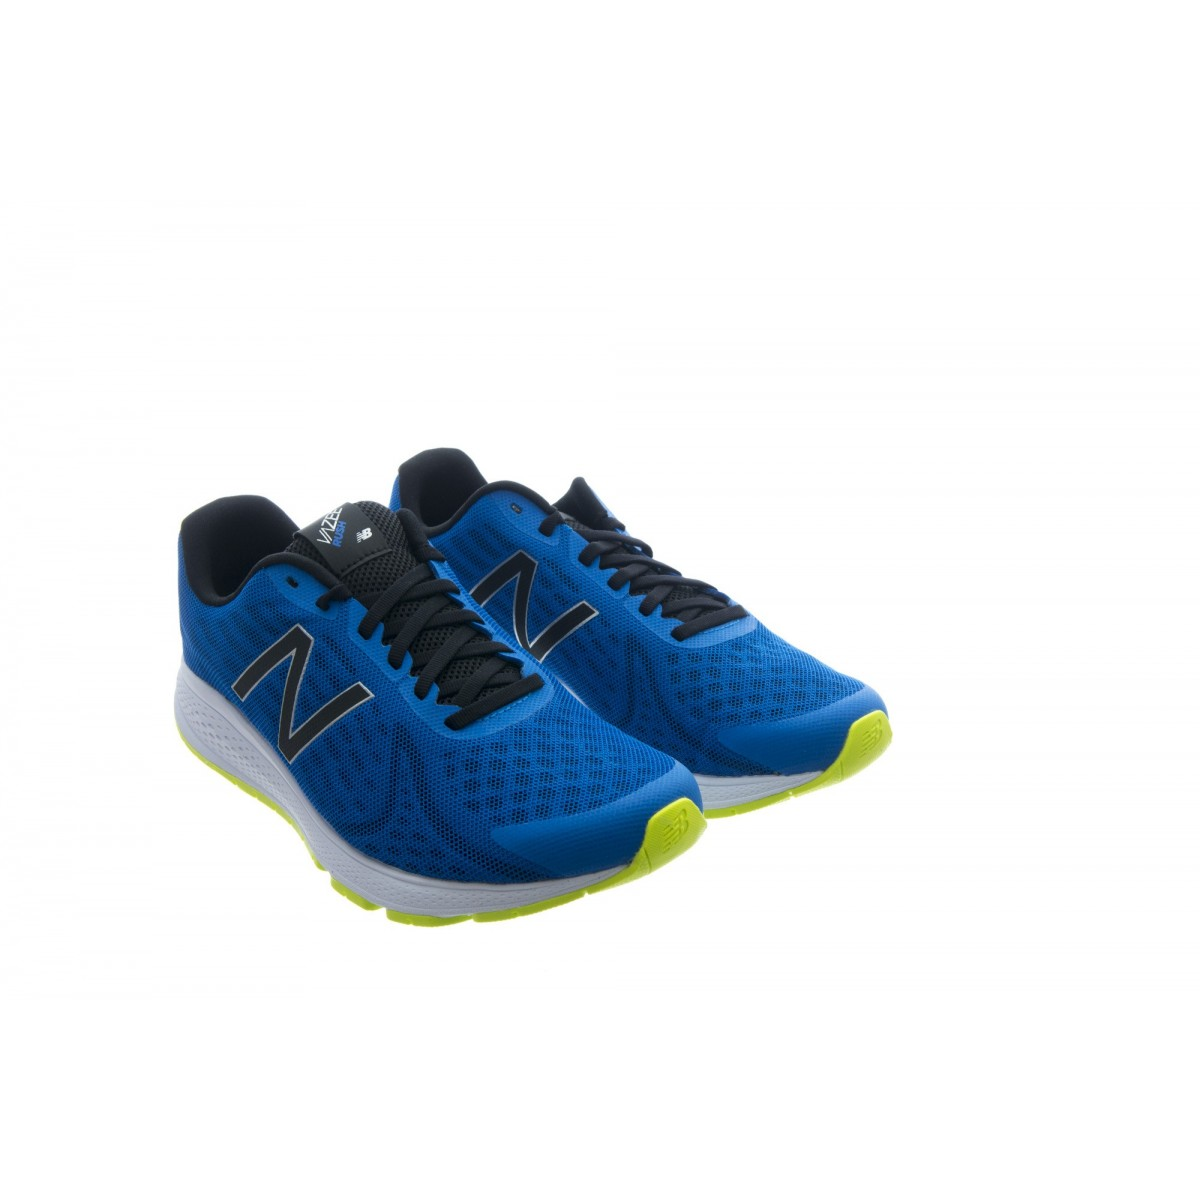 Scarpe - M rush running fashion